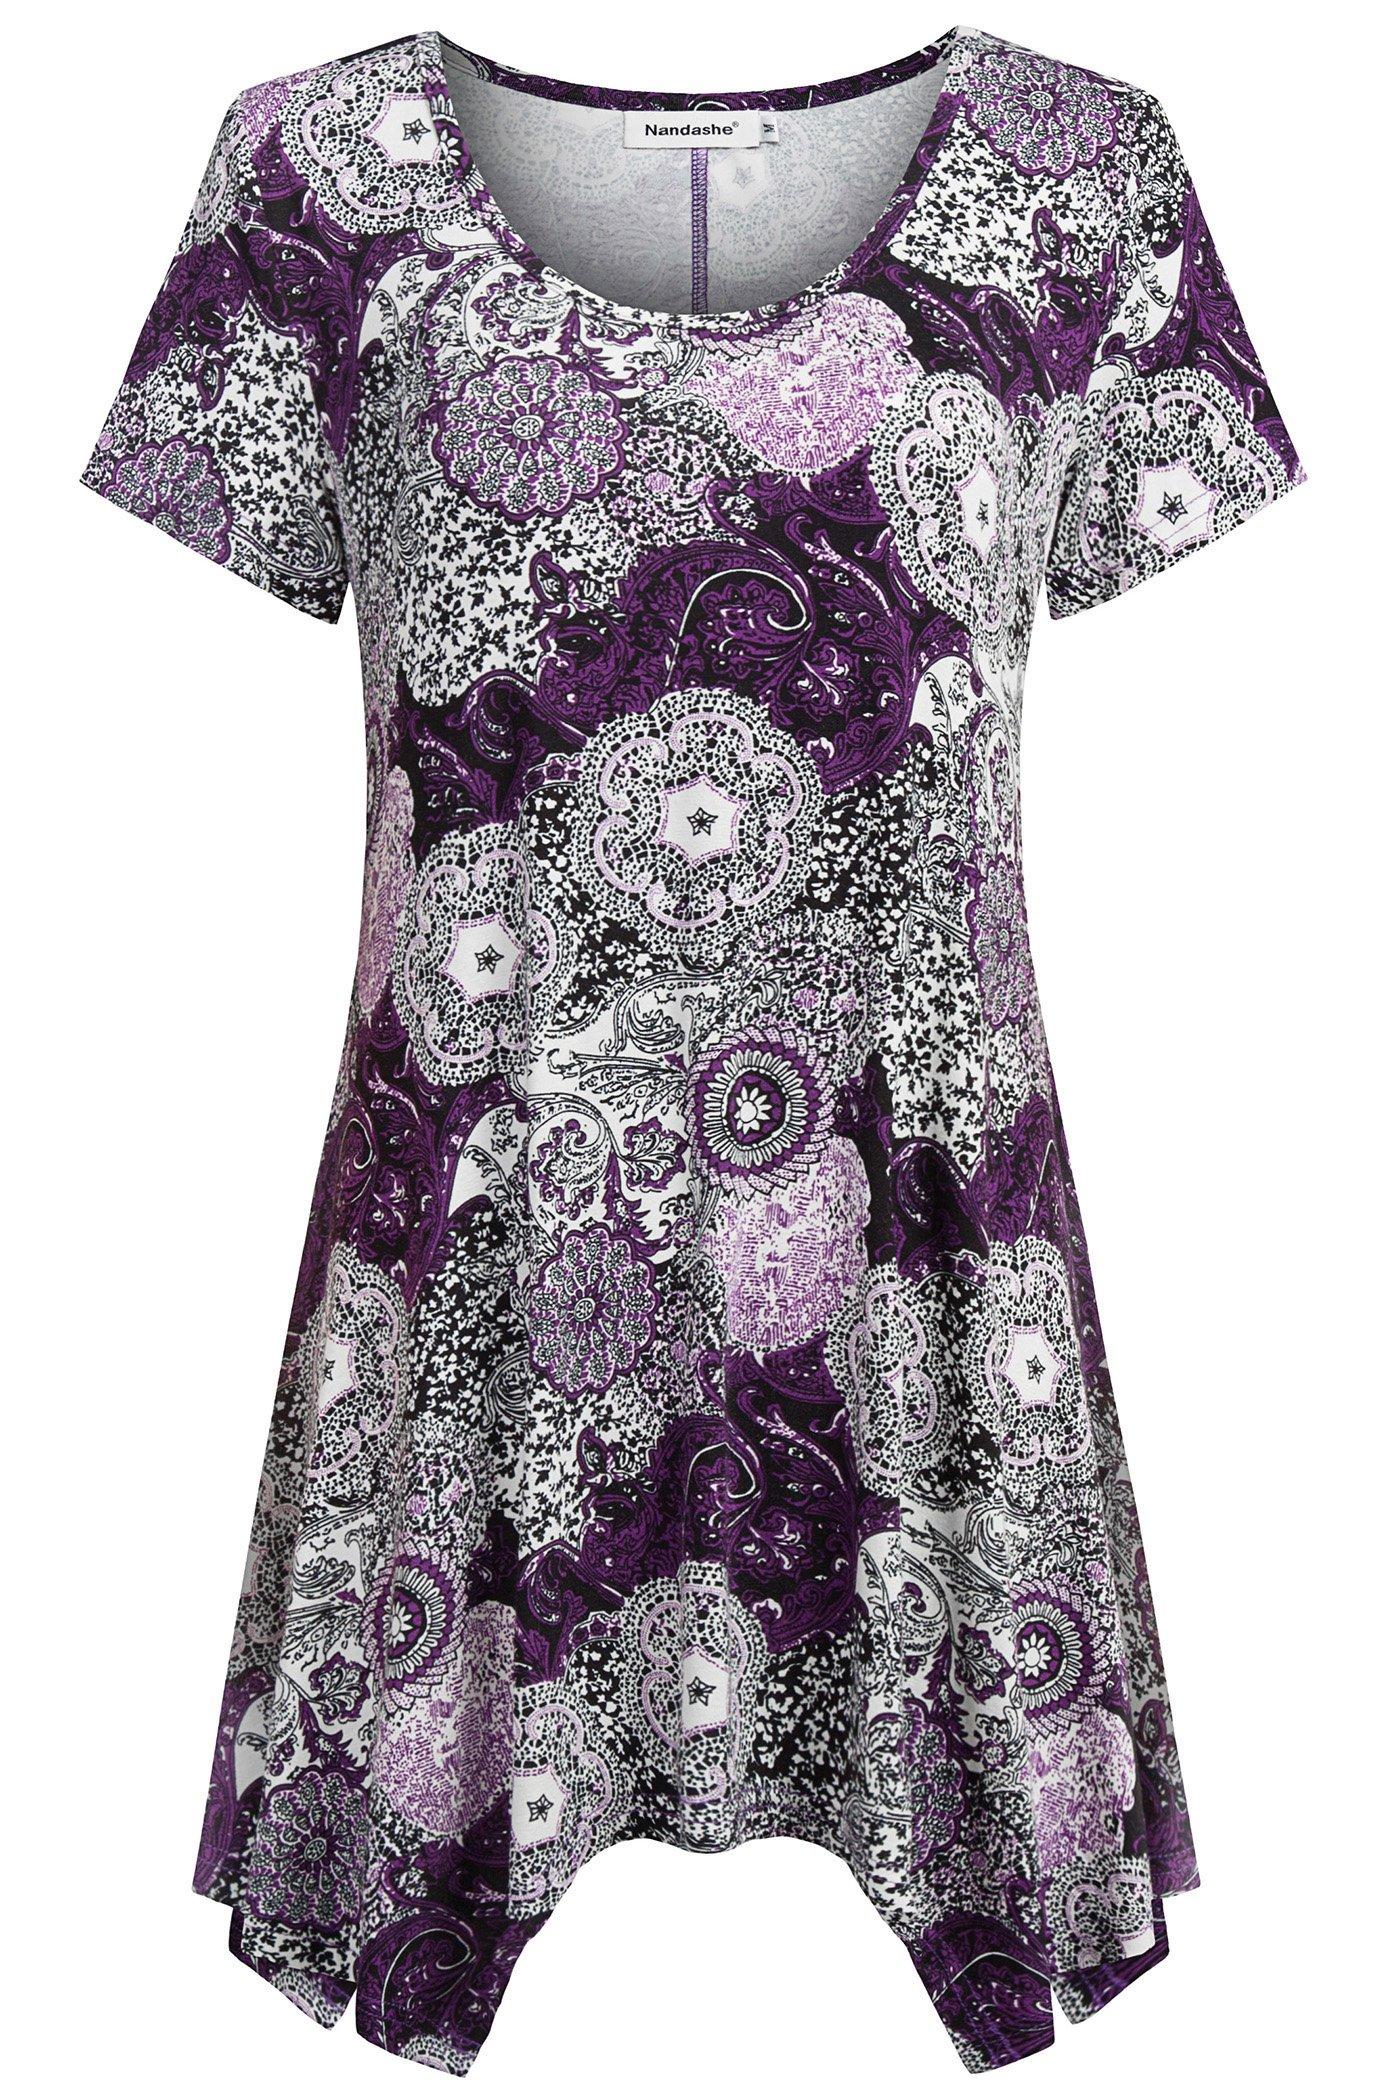 Nandashe Tunics for Leggings for Women, Single Women Short Length Sleeves Multicolor Round Neck Soft Comfoy Pullover Sweaters Bohemian Shirts Purple XXL